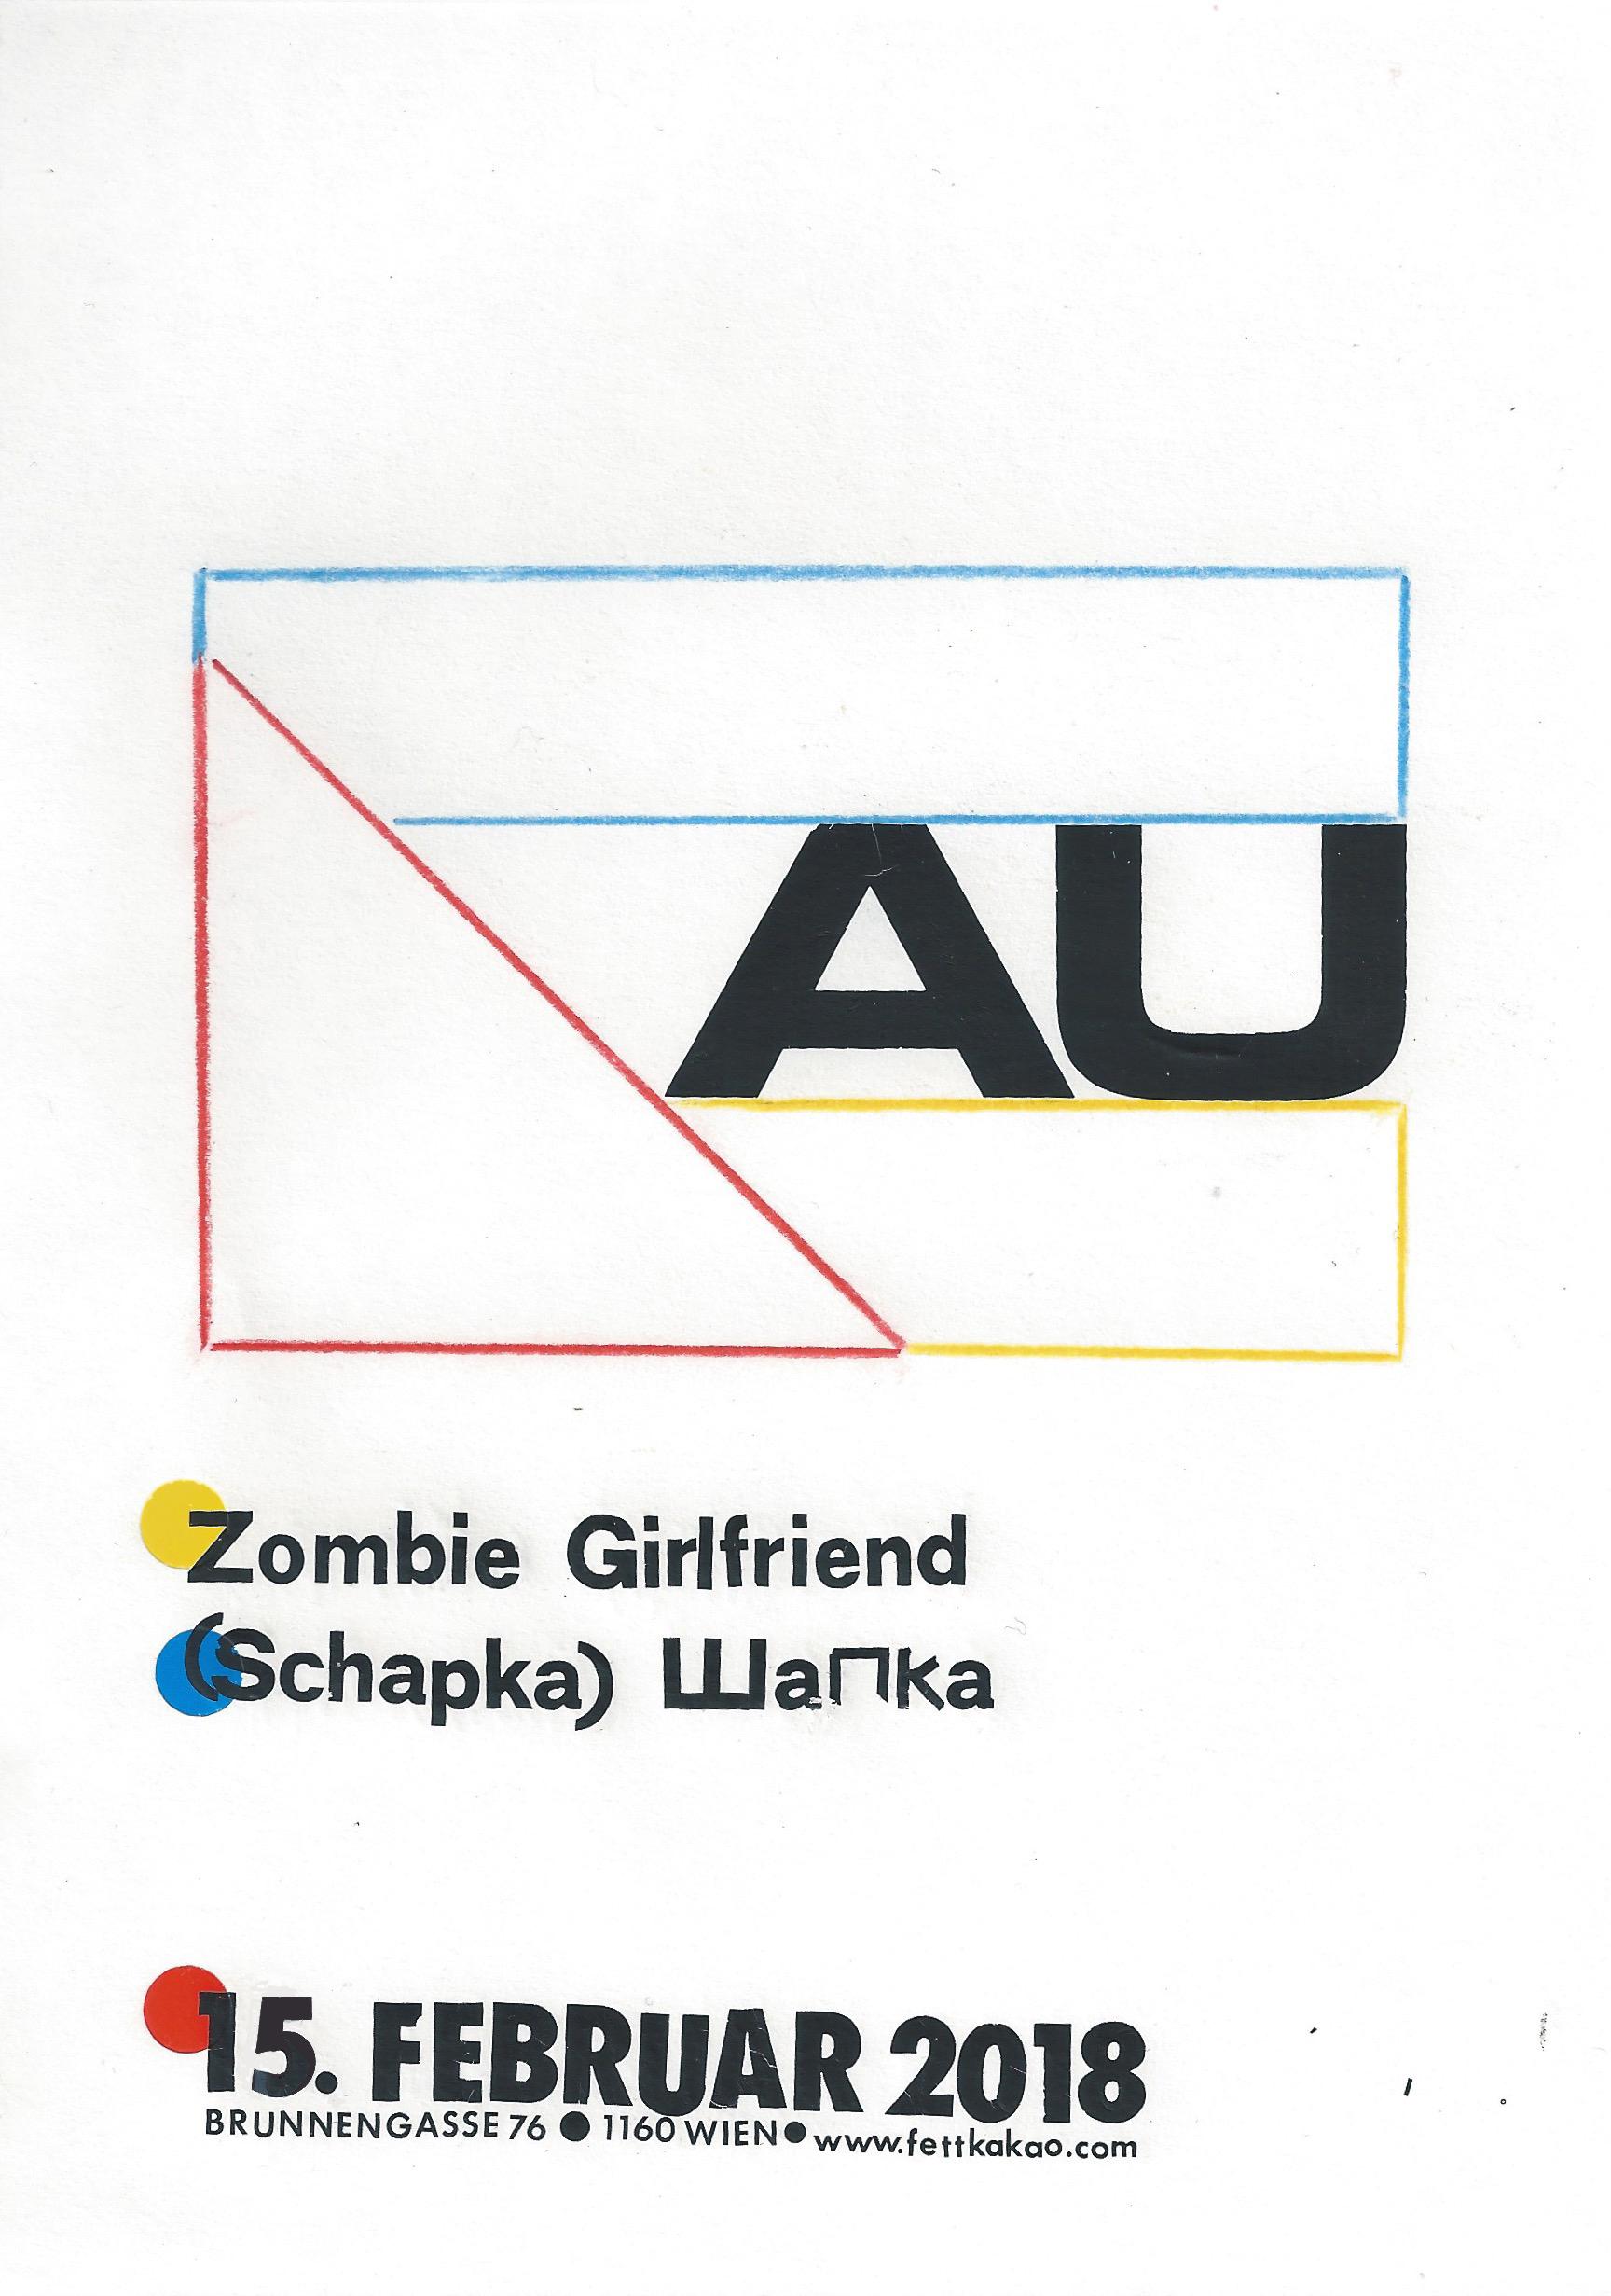 Шапка (Schapka) & Zombie Girlfriend